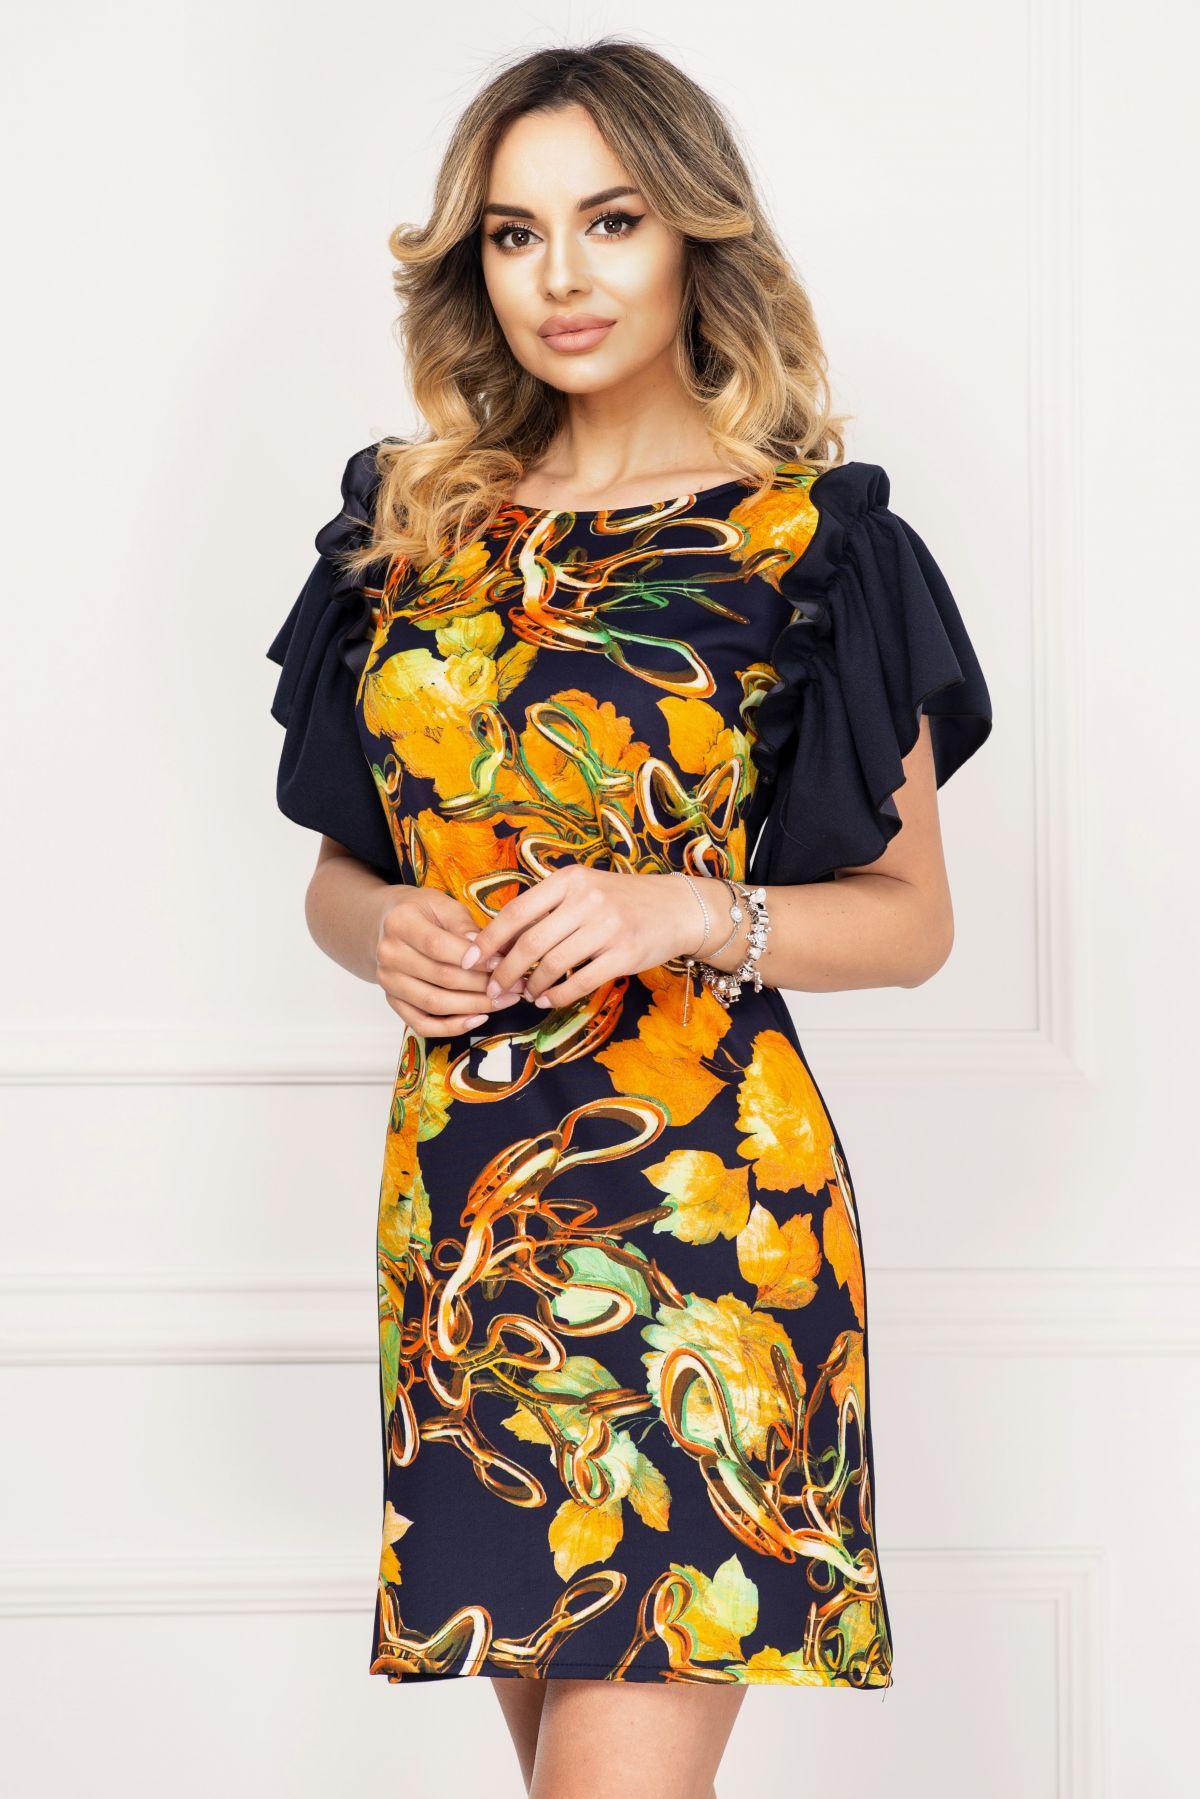 Rochie de zi Alexa bleumarin cu imprimeu floral orange image0